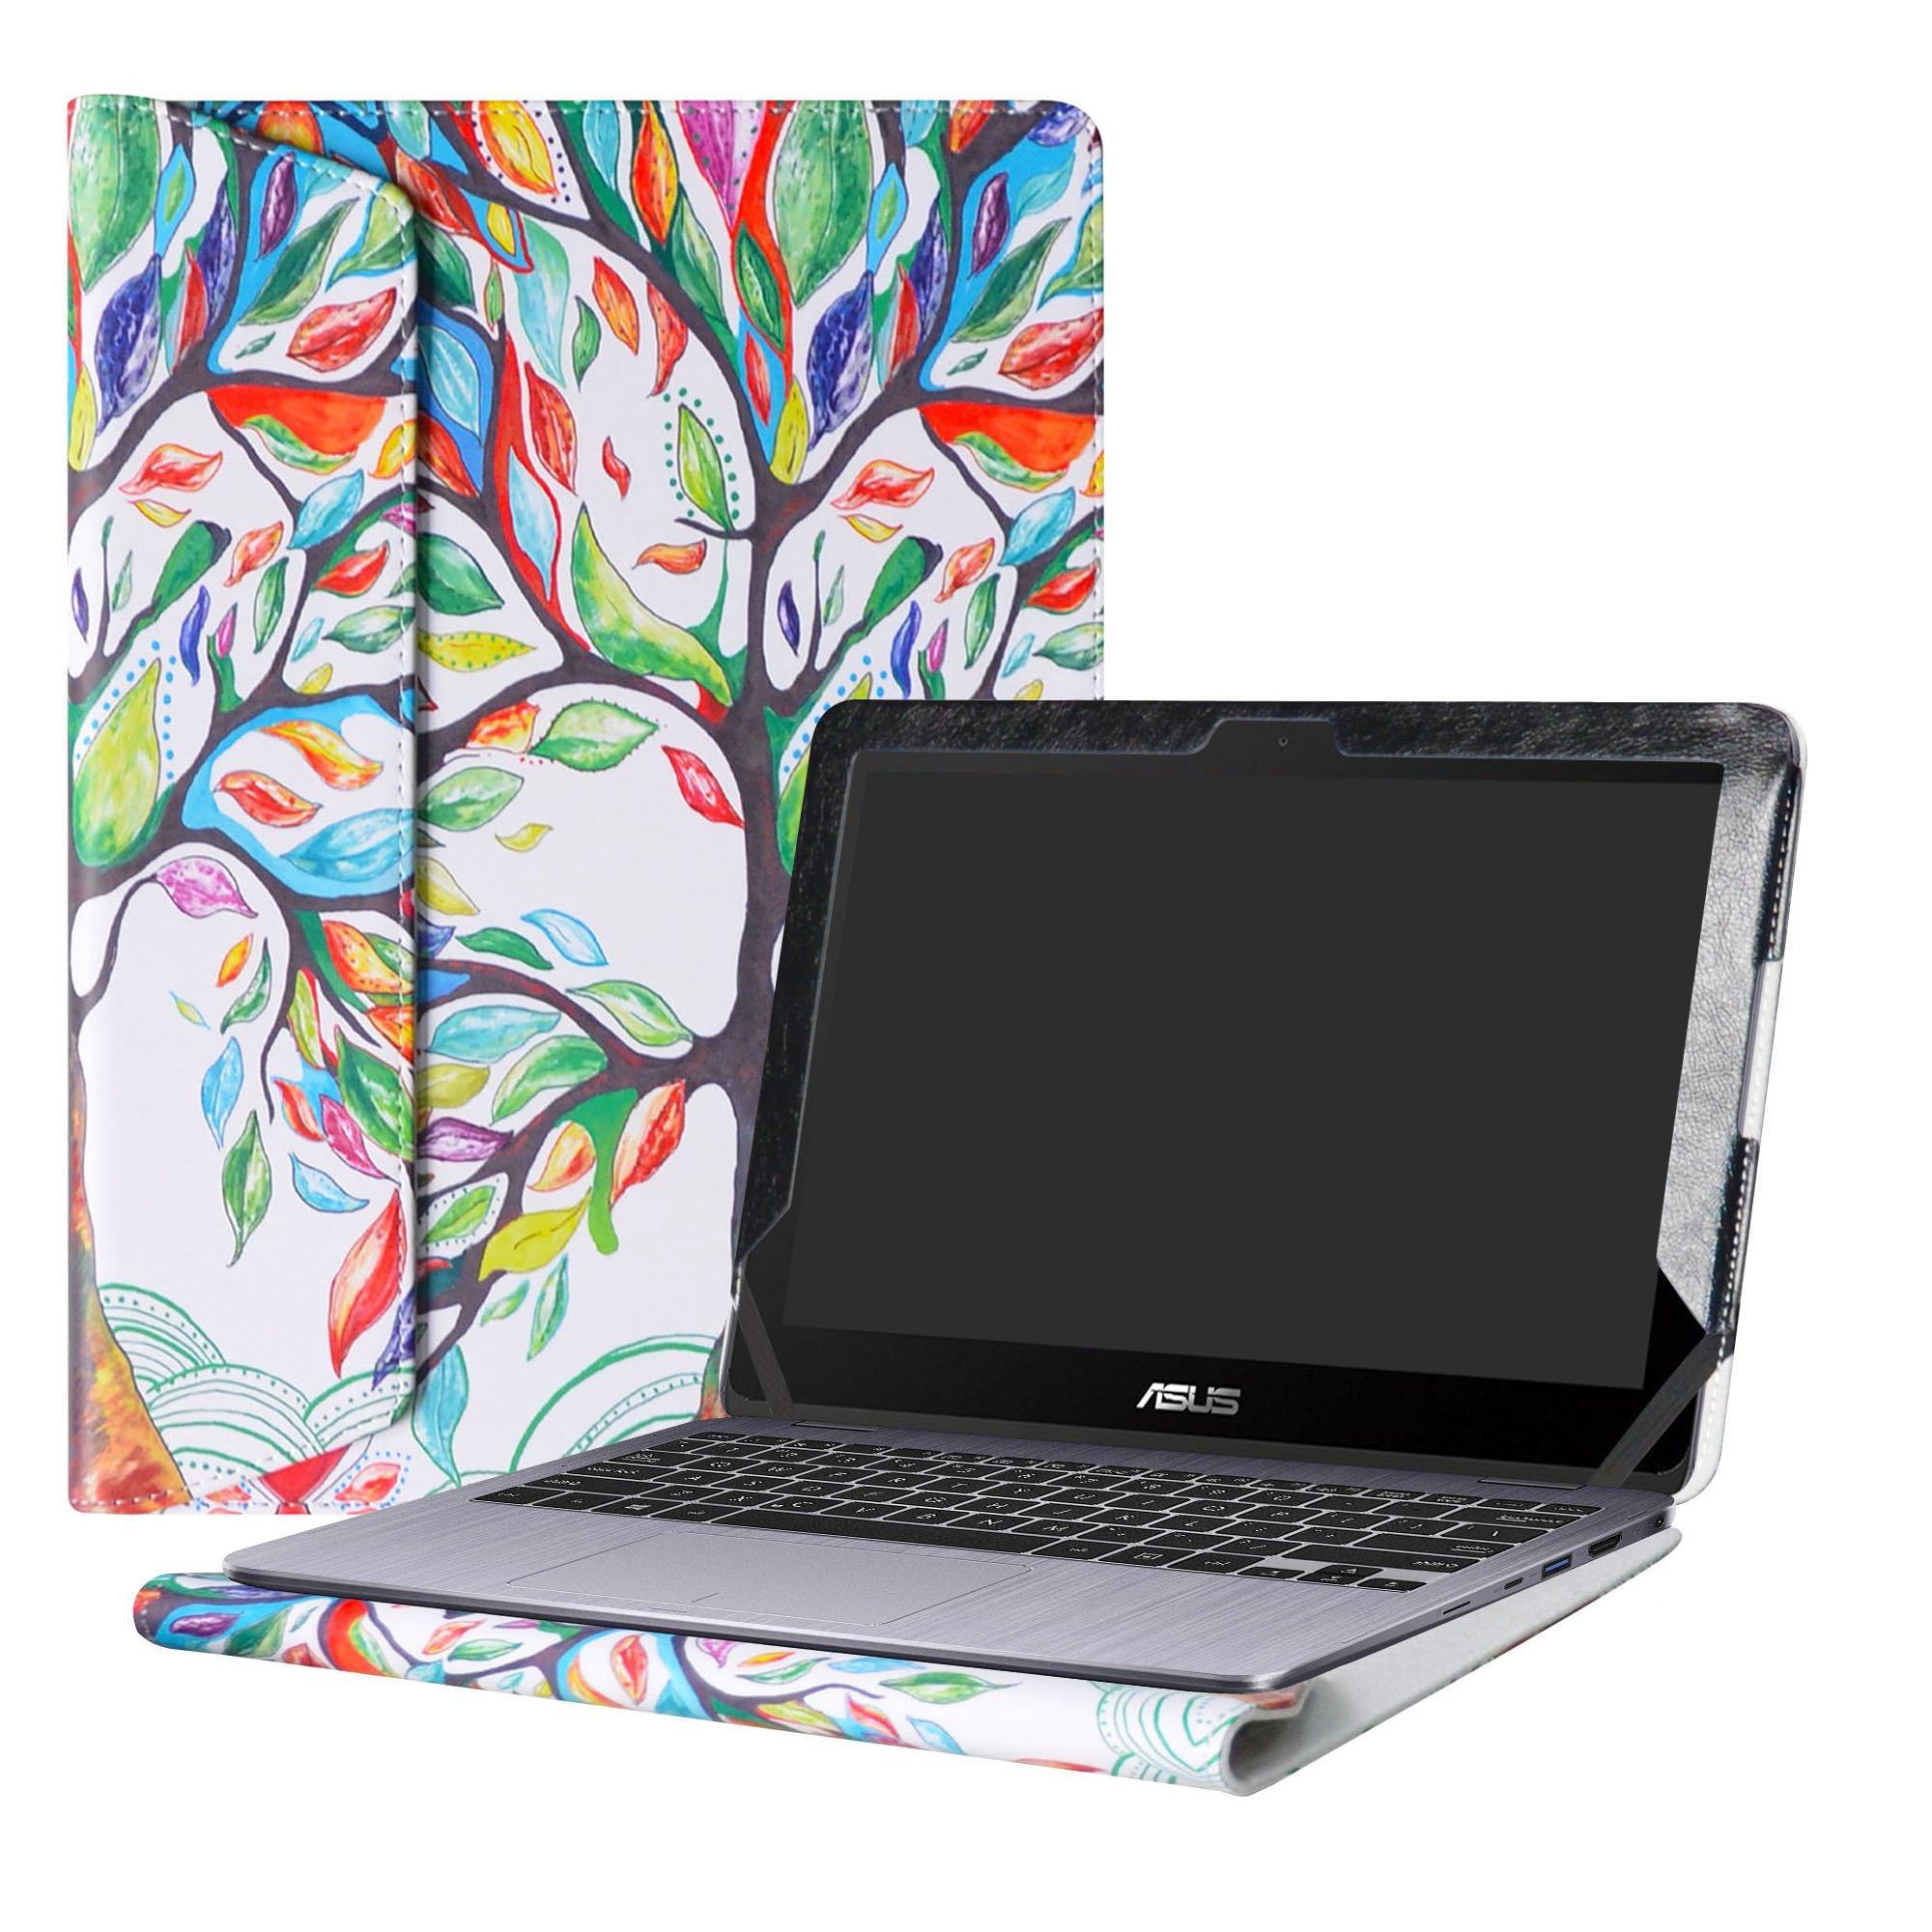 Alapmk Protective Case Cover For 11.6'' ASUS VivoBook Flip 12 TP203NA tp203na-uh01t Series Laptop(Warning:Only fit model TP203NA),Love Tree